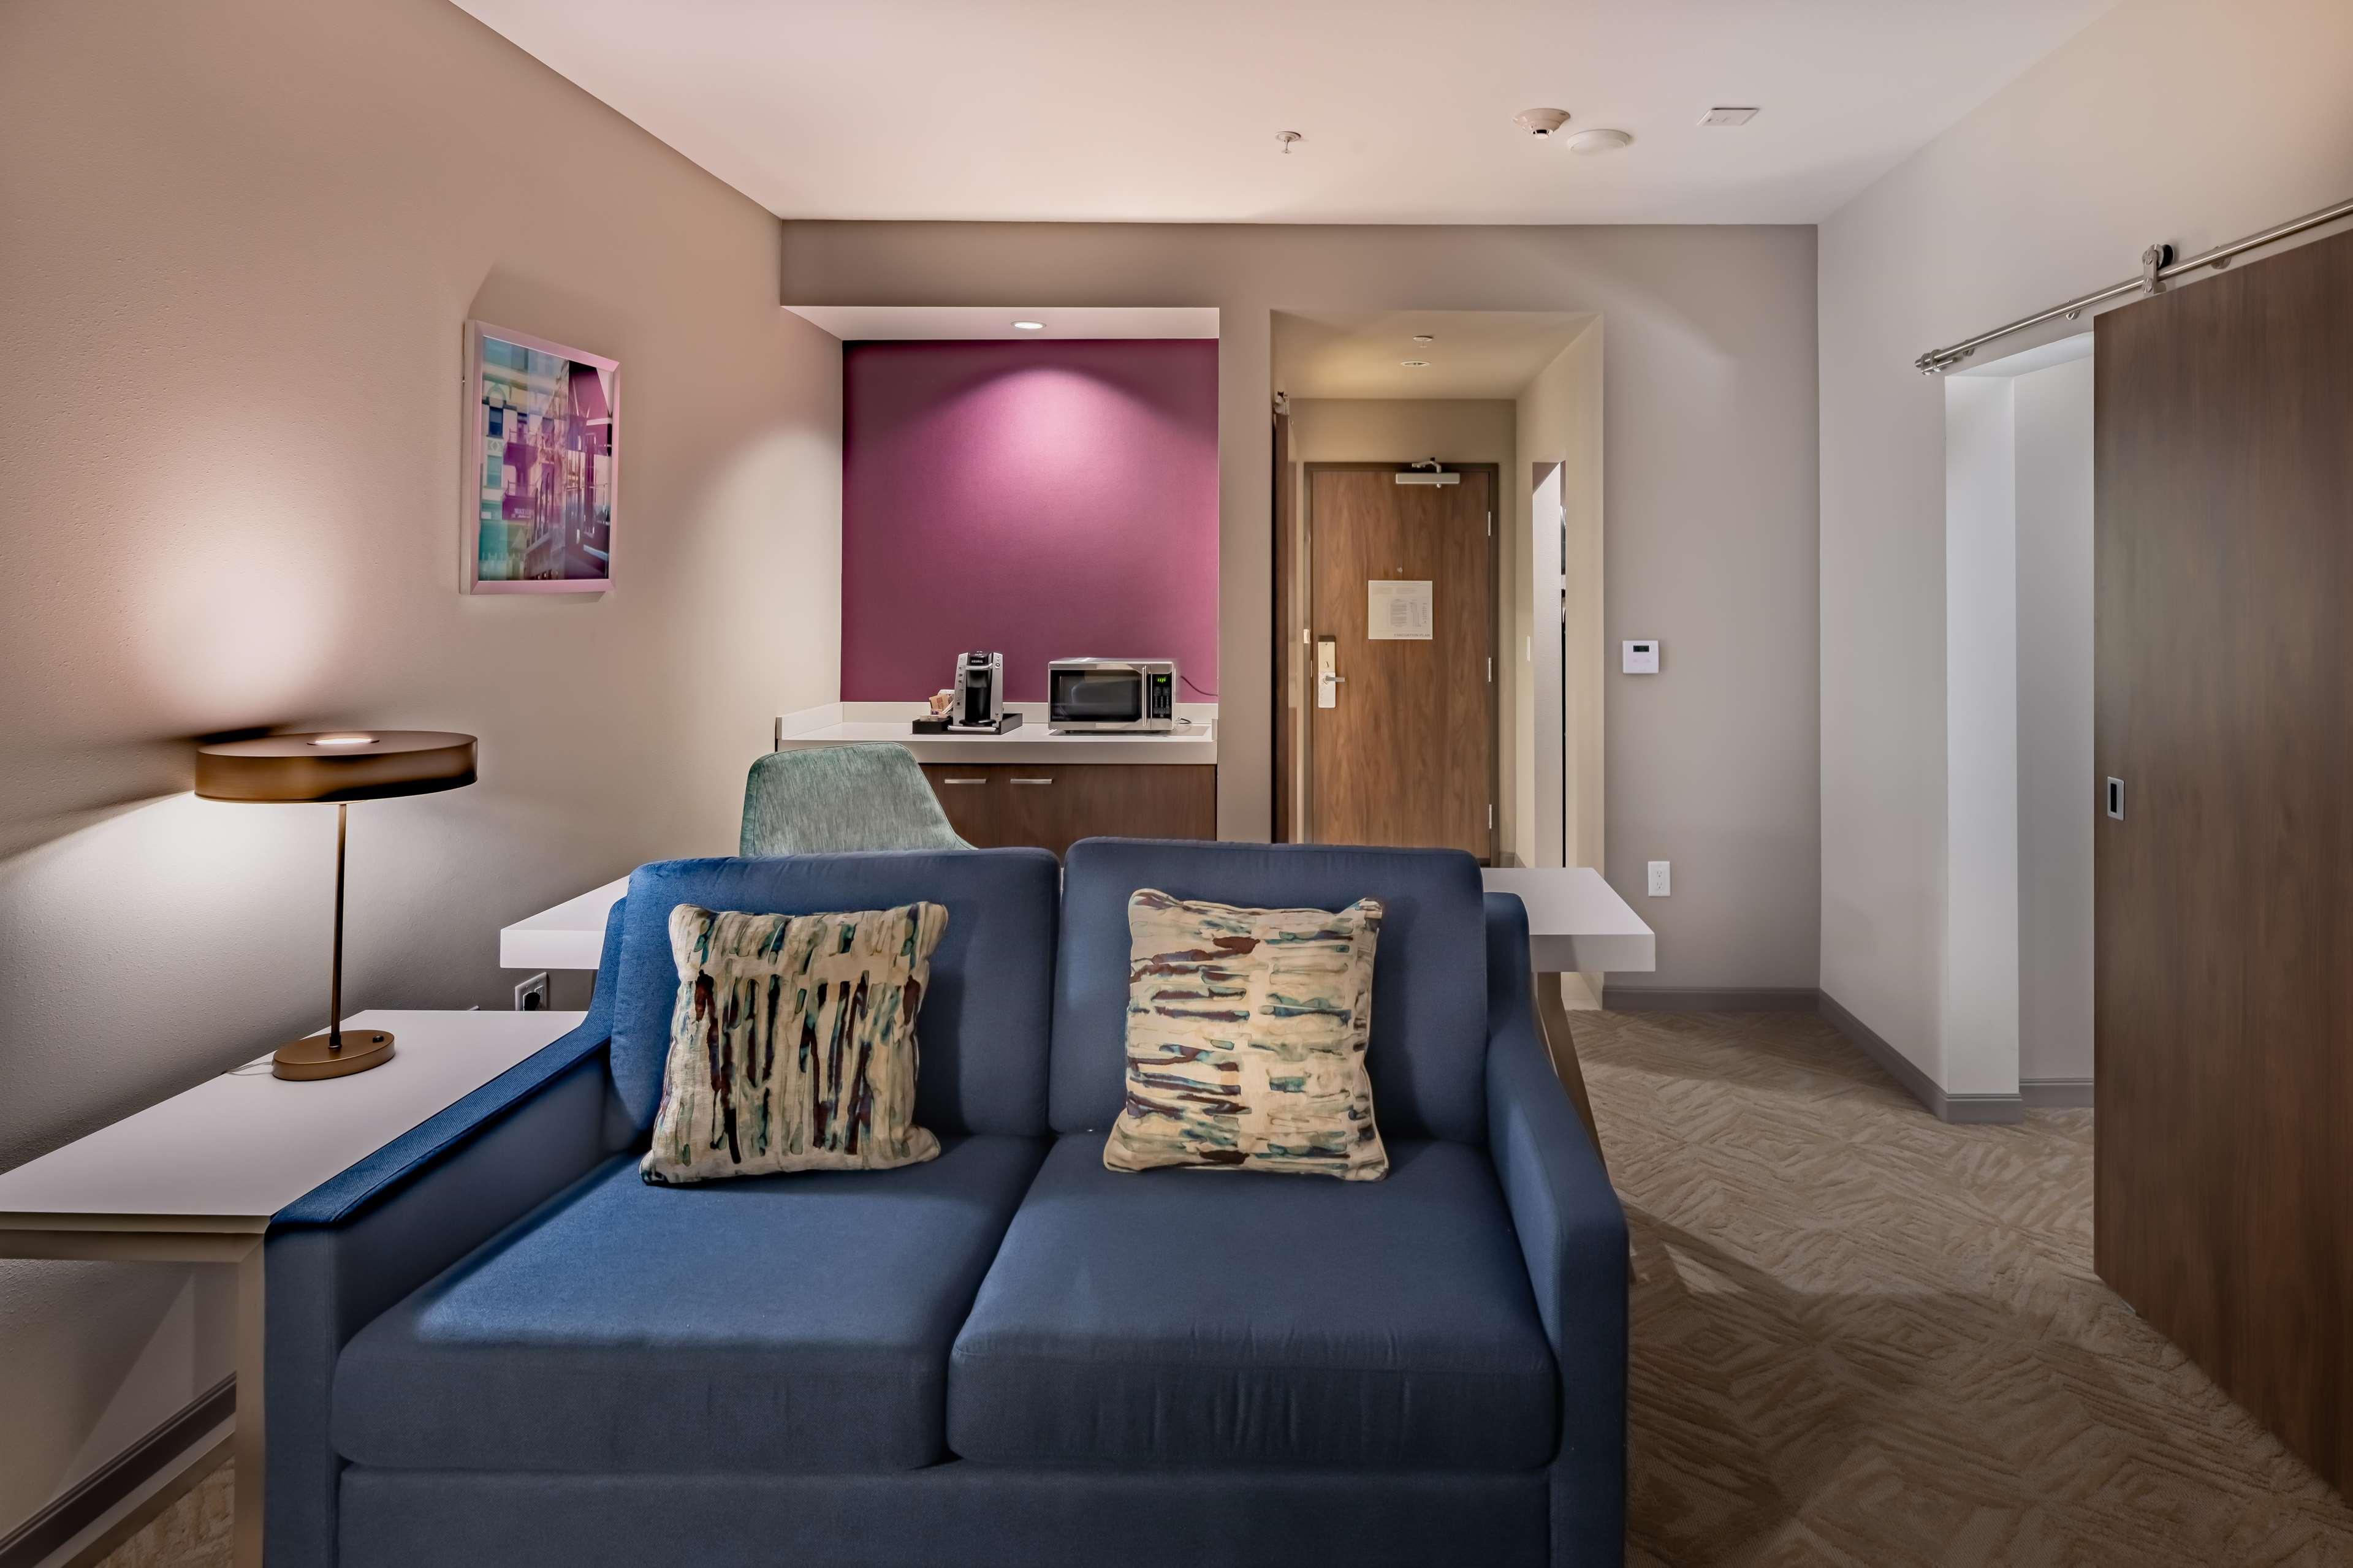 Hilton Garden Inn Dallas at Hurst Conference Center image 23